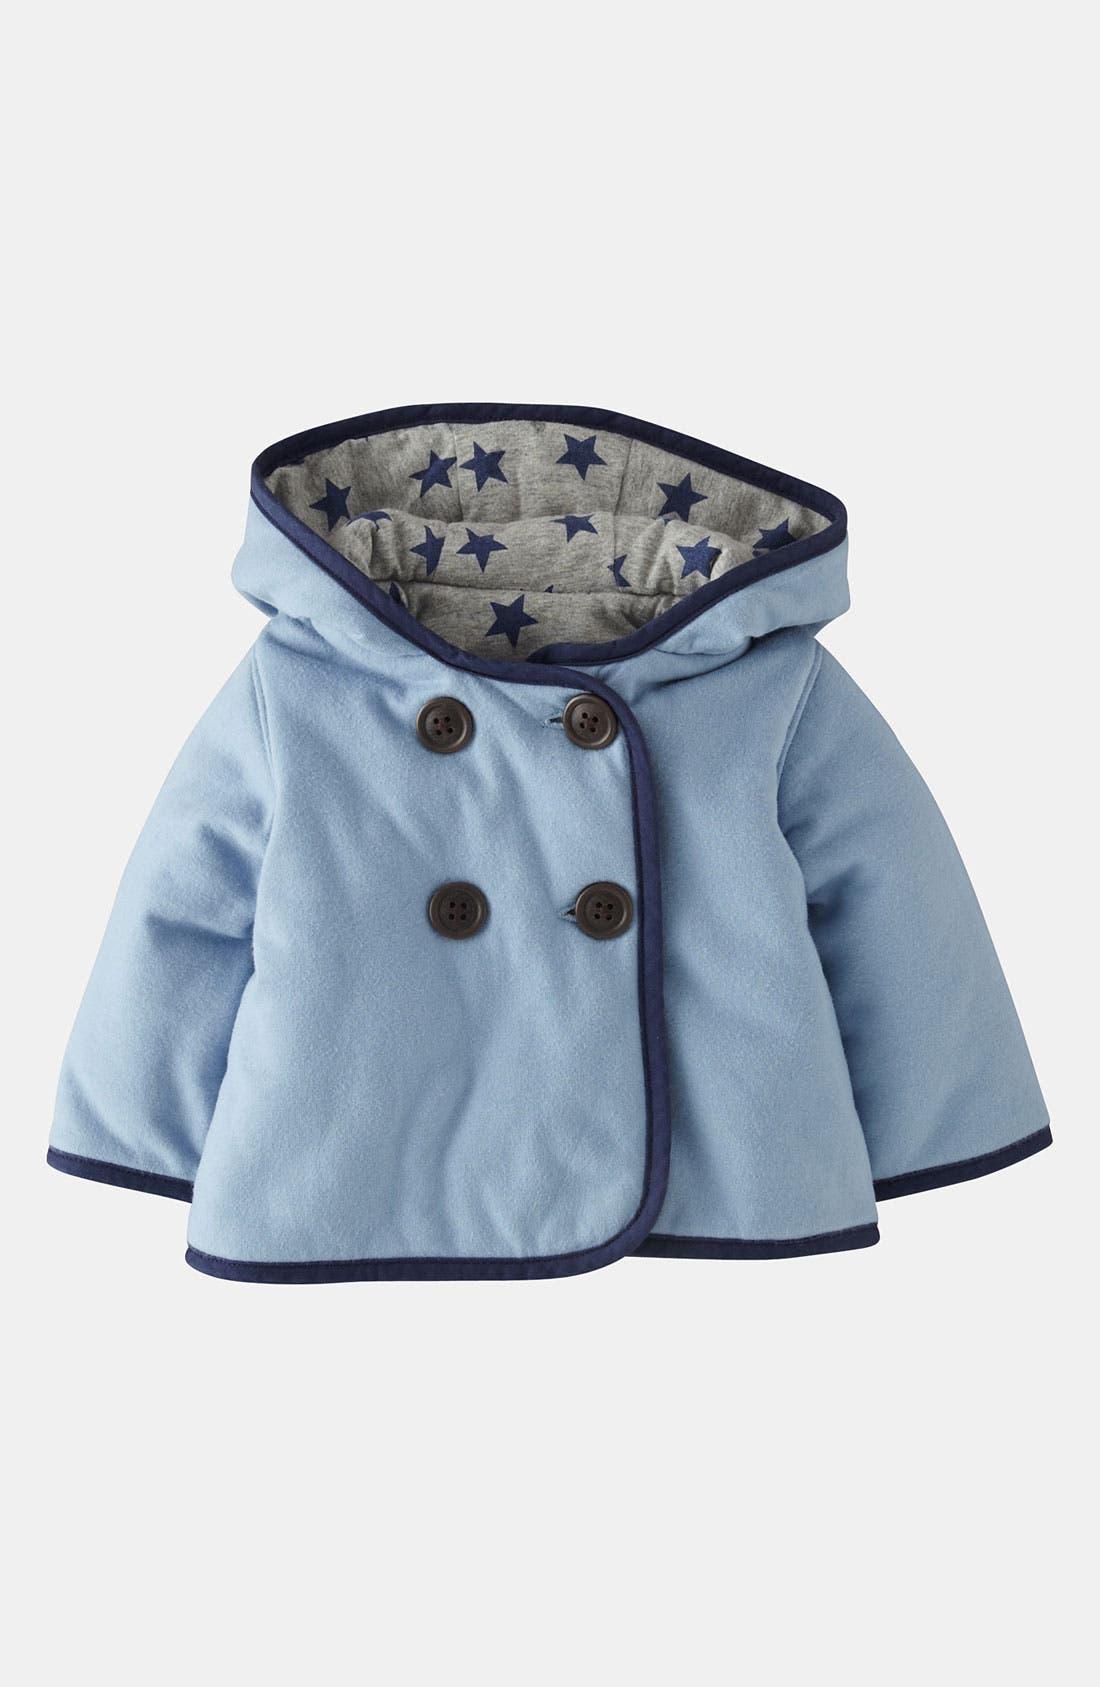 Main Image - Mini Boden Padded Jersey Jacket (Baby)